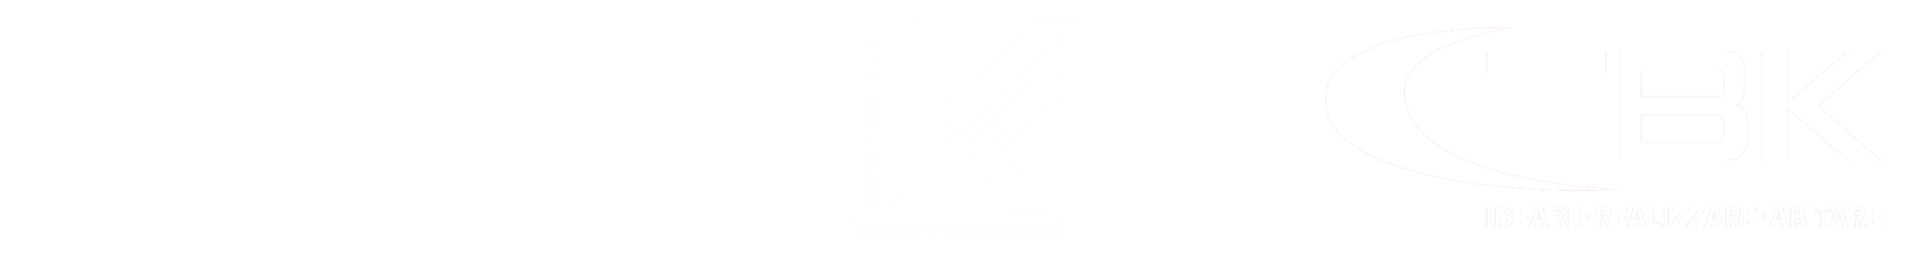 Clienti - Myobrace - Keyfin - TBK